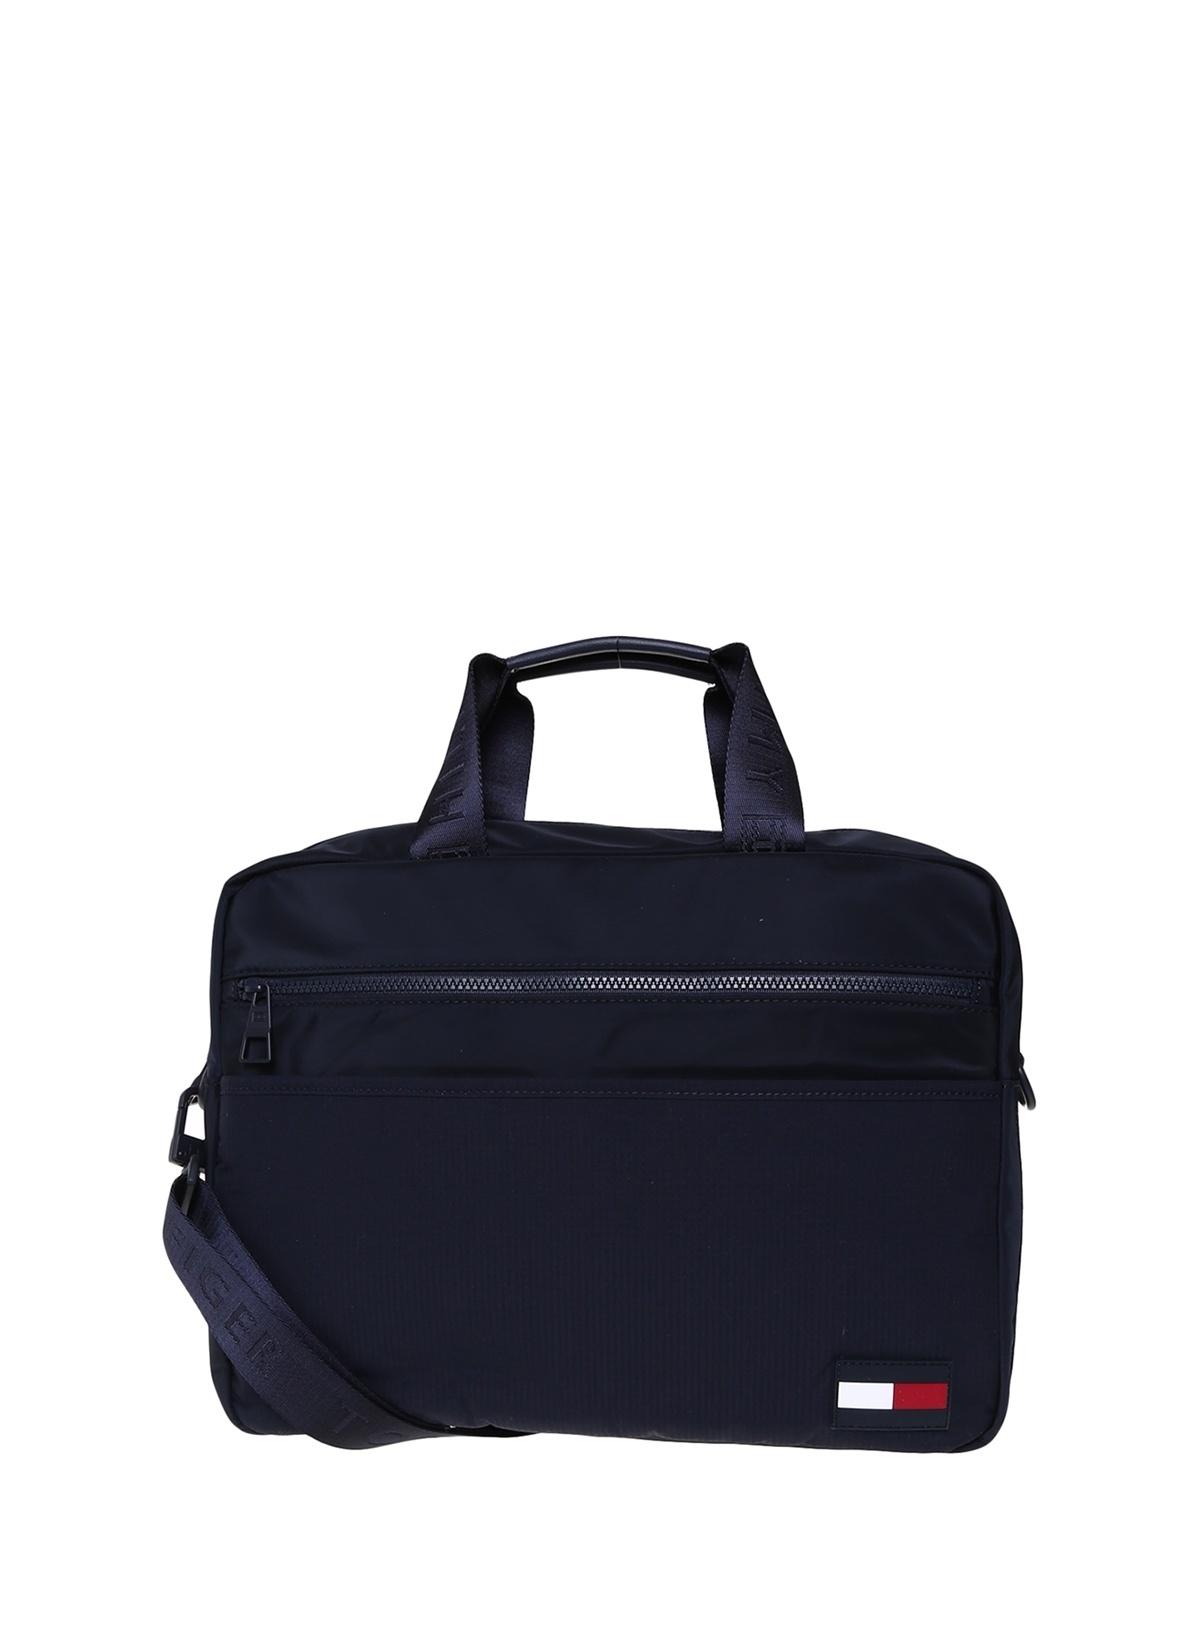 Tommy Hilfiger Laptop – Evrak Çantası Am0am04252413-tommy-hilfiger-lapto – 809.0 TL